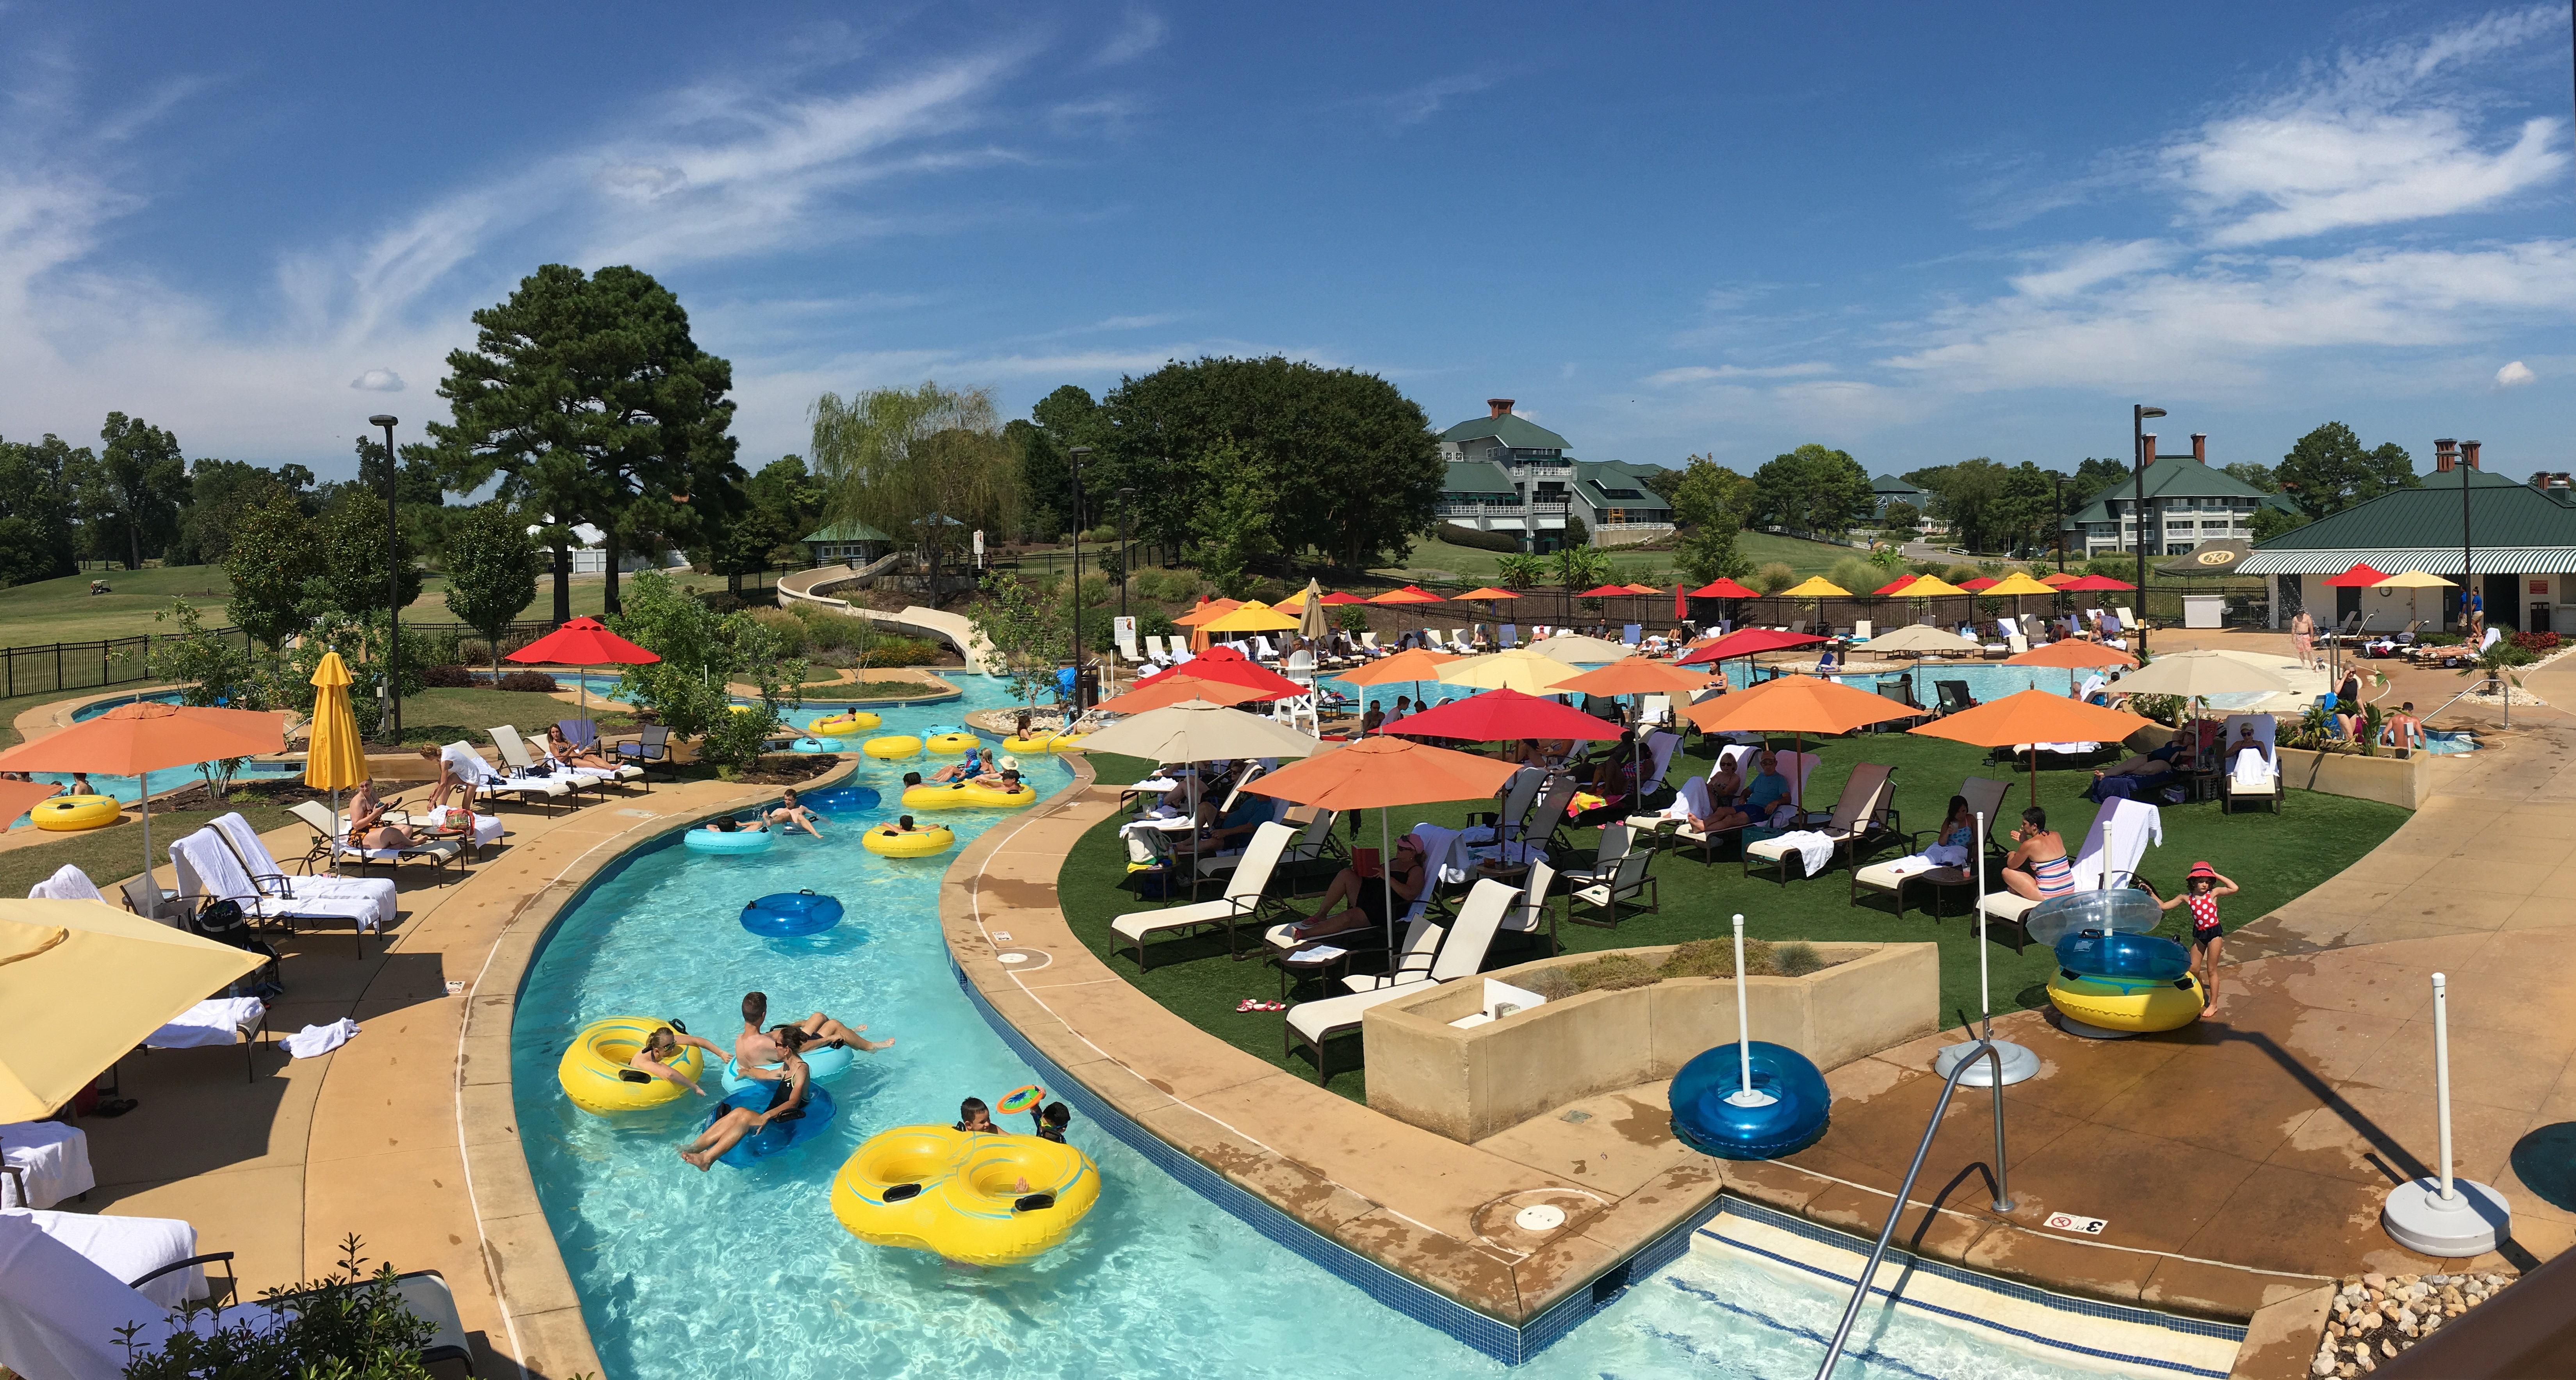 The River Pool Recreation At Kingsmill Resort